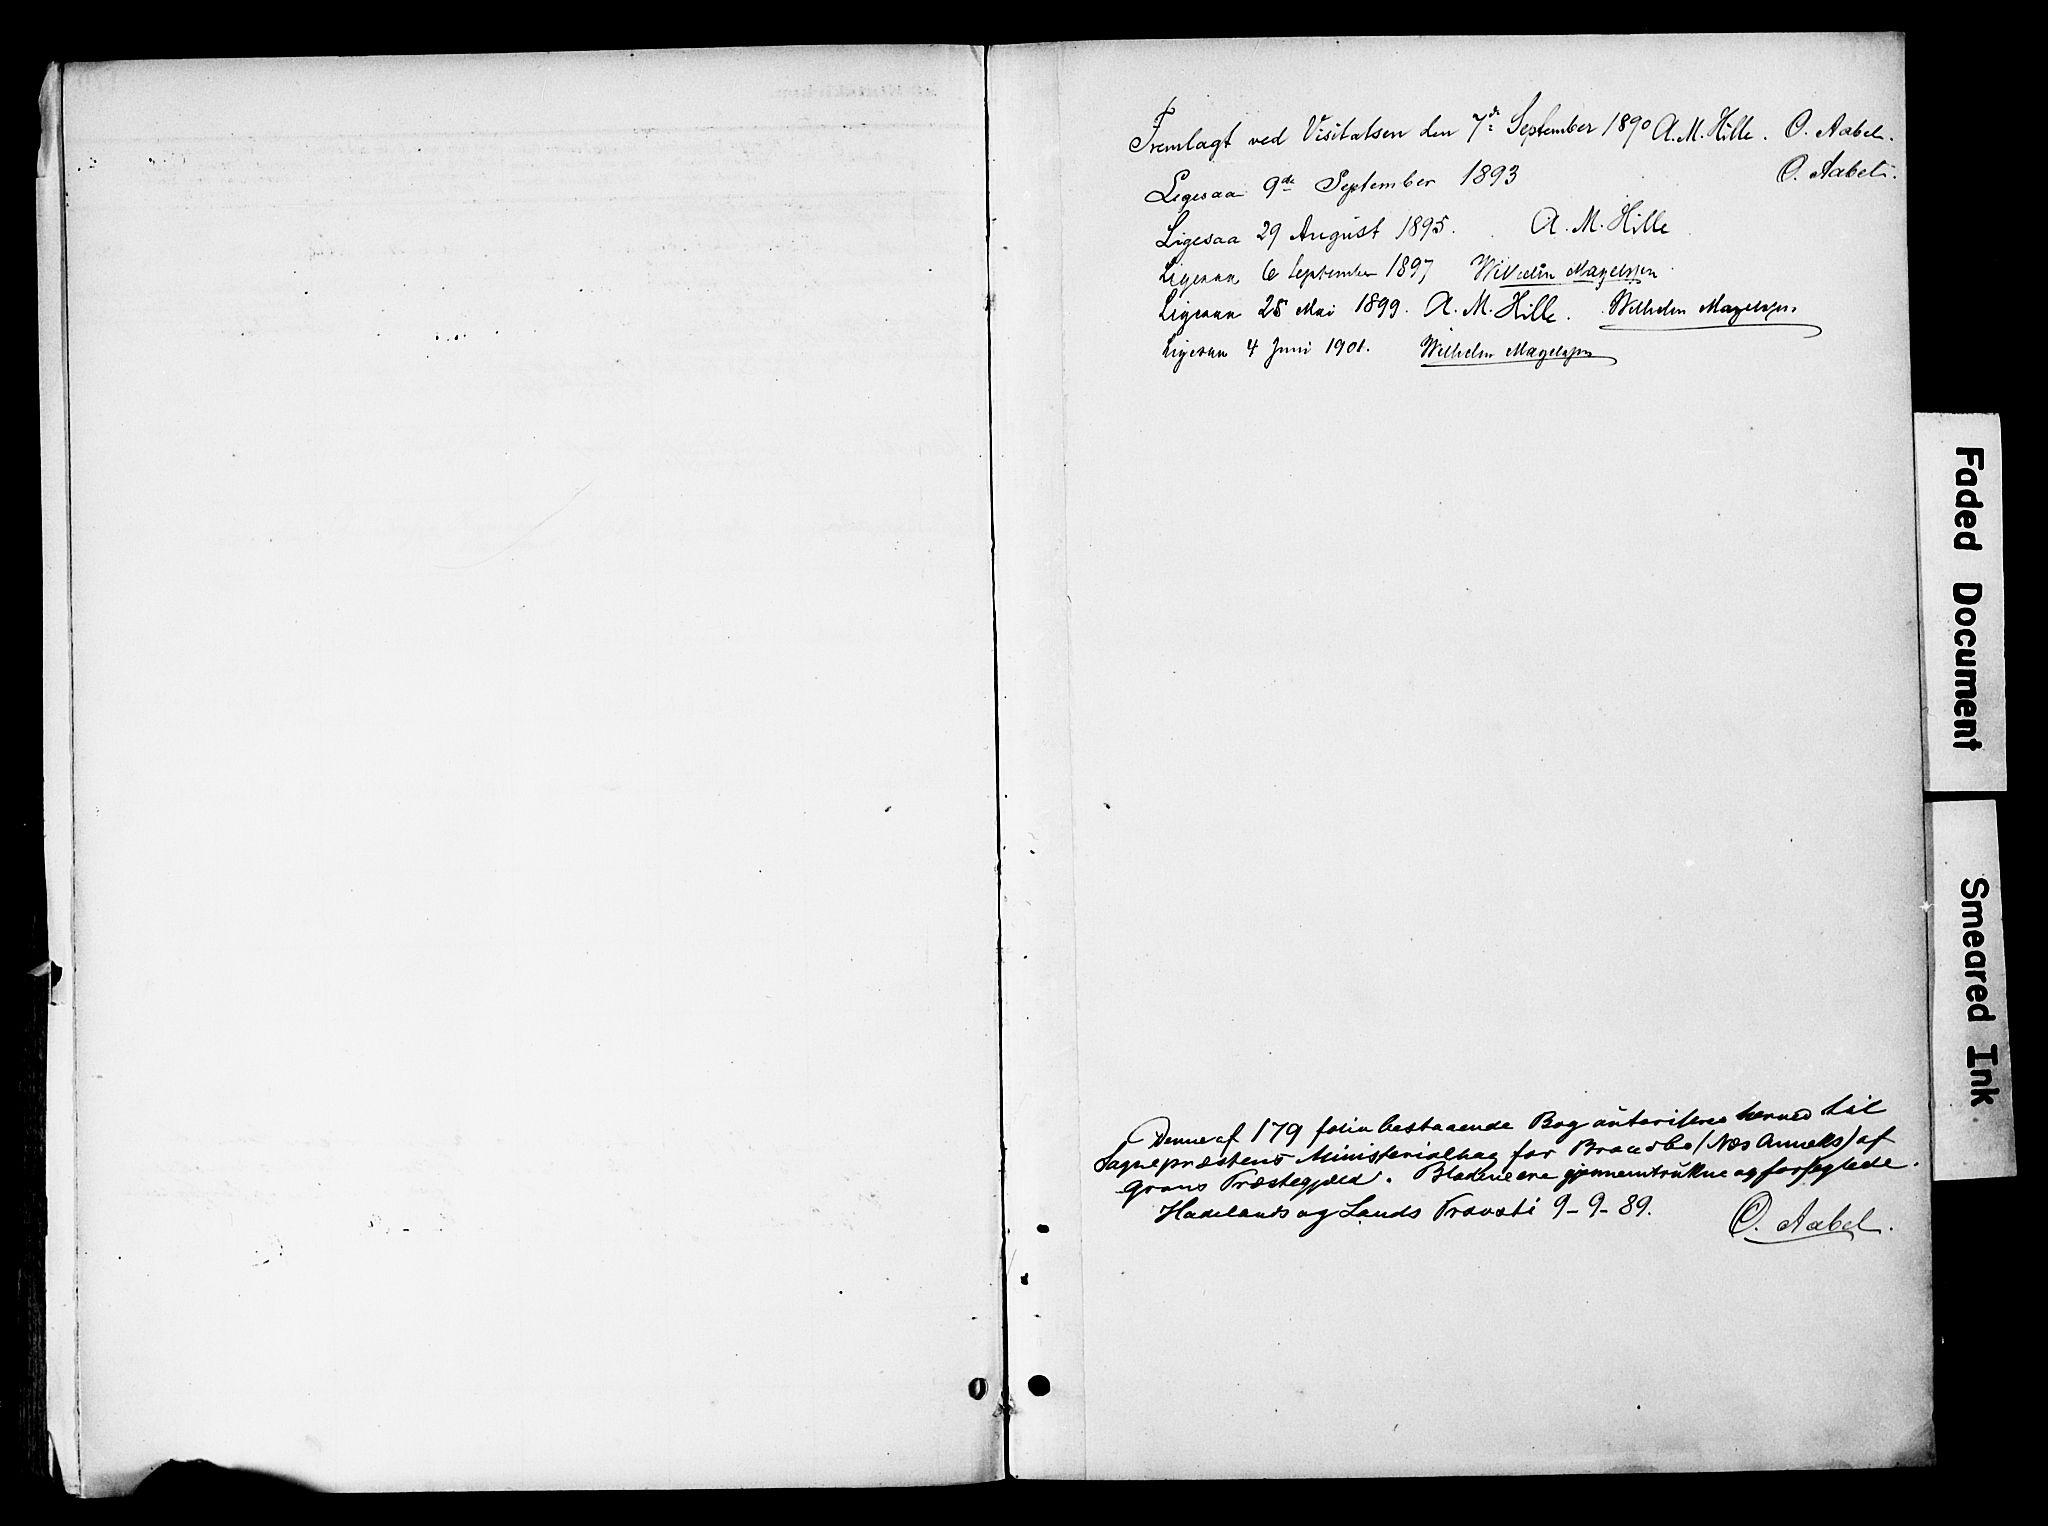 SAH, Gran prestekontor, Ministerialbok nr. 20, 1889-1899